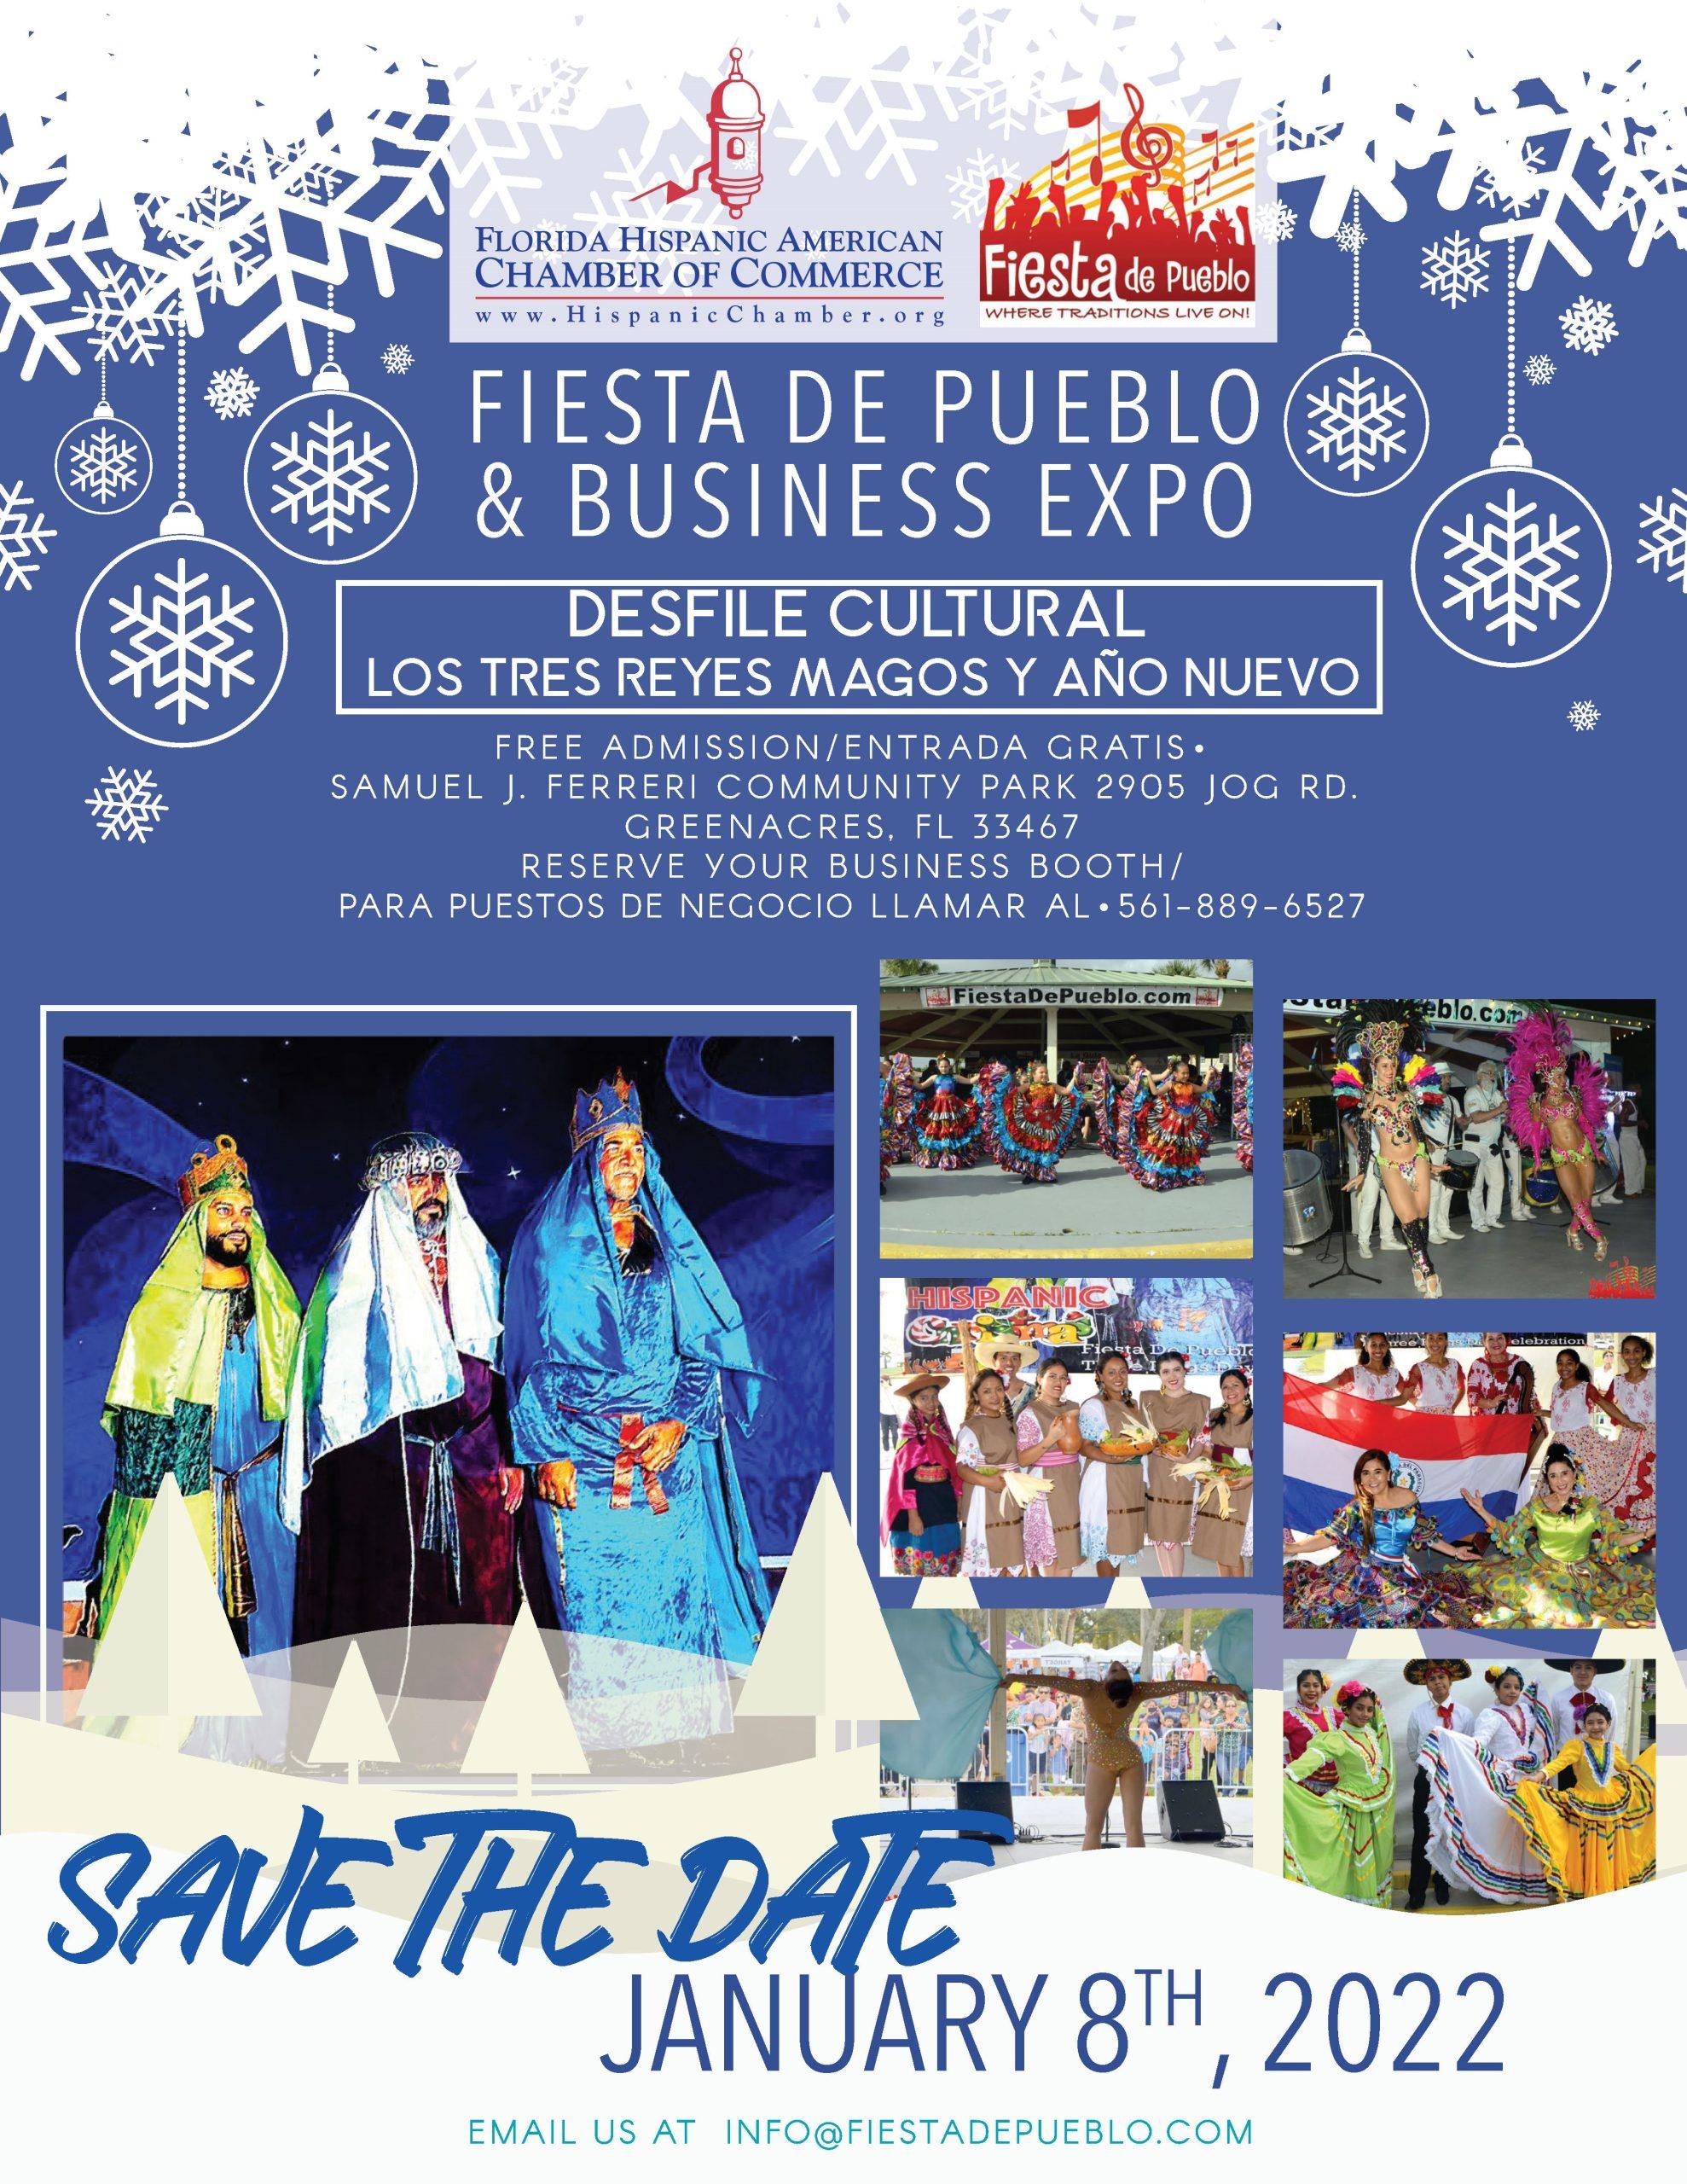 Fiesta De Pueblo & Business Expo 2022